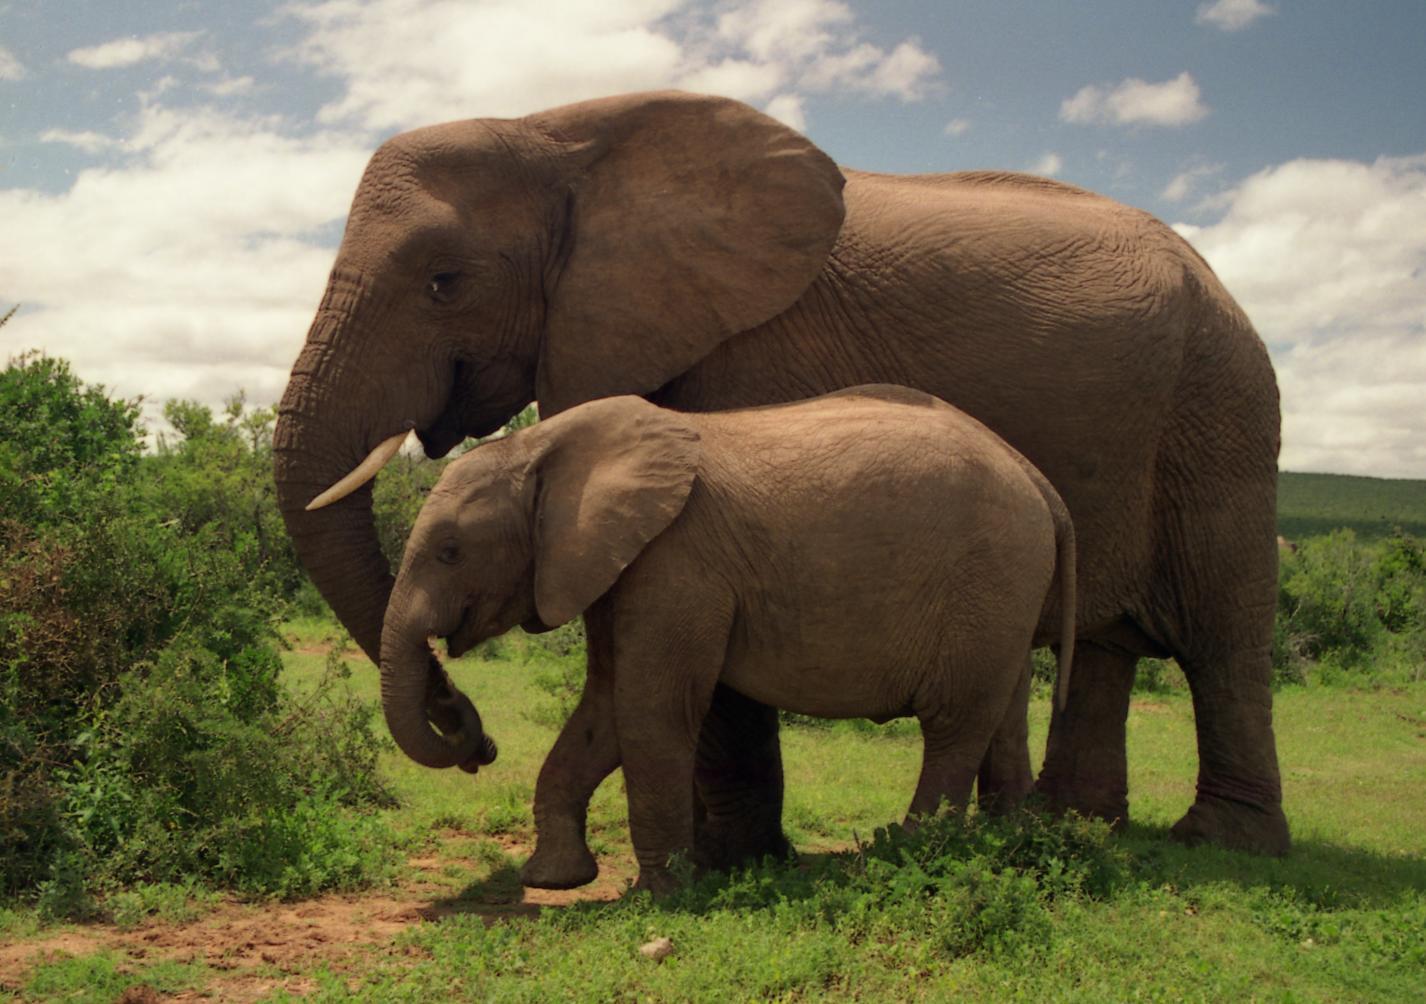 Wallpaper download elephant - Images Elephants